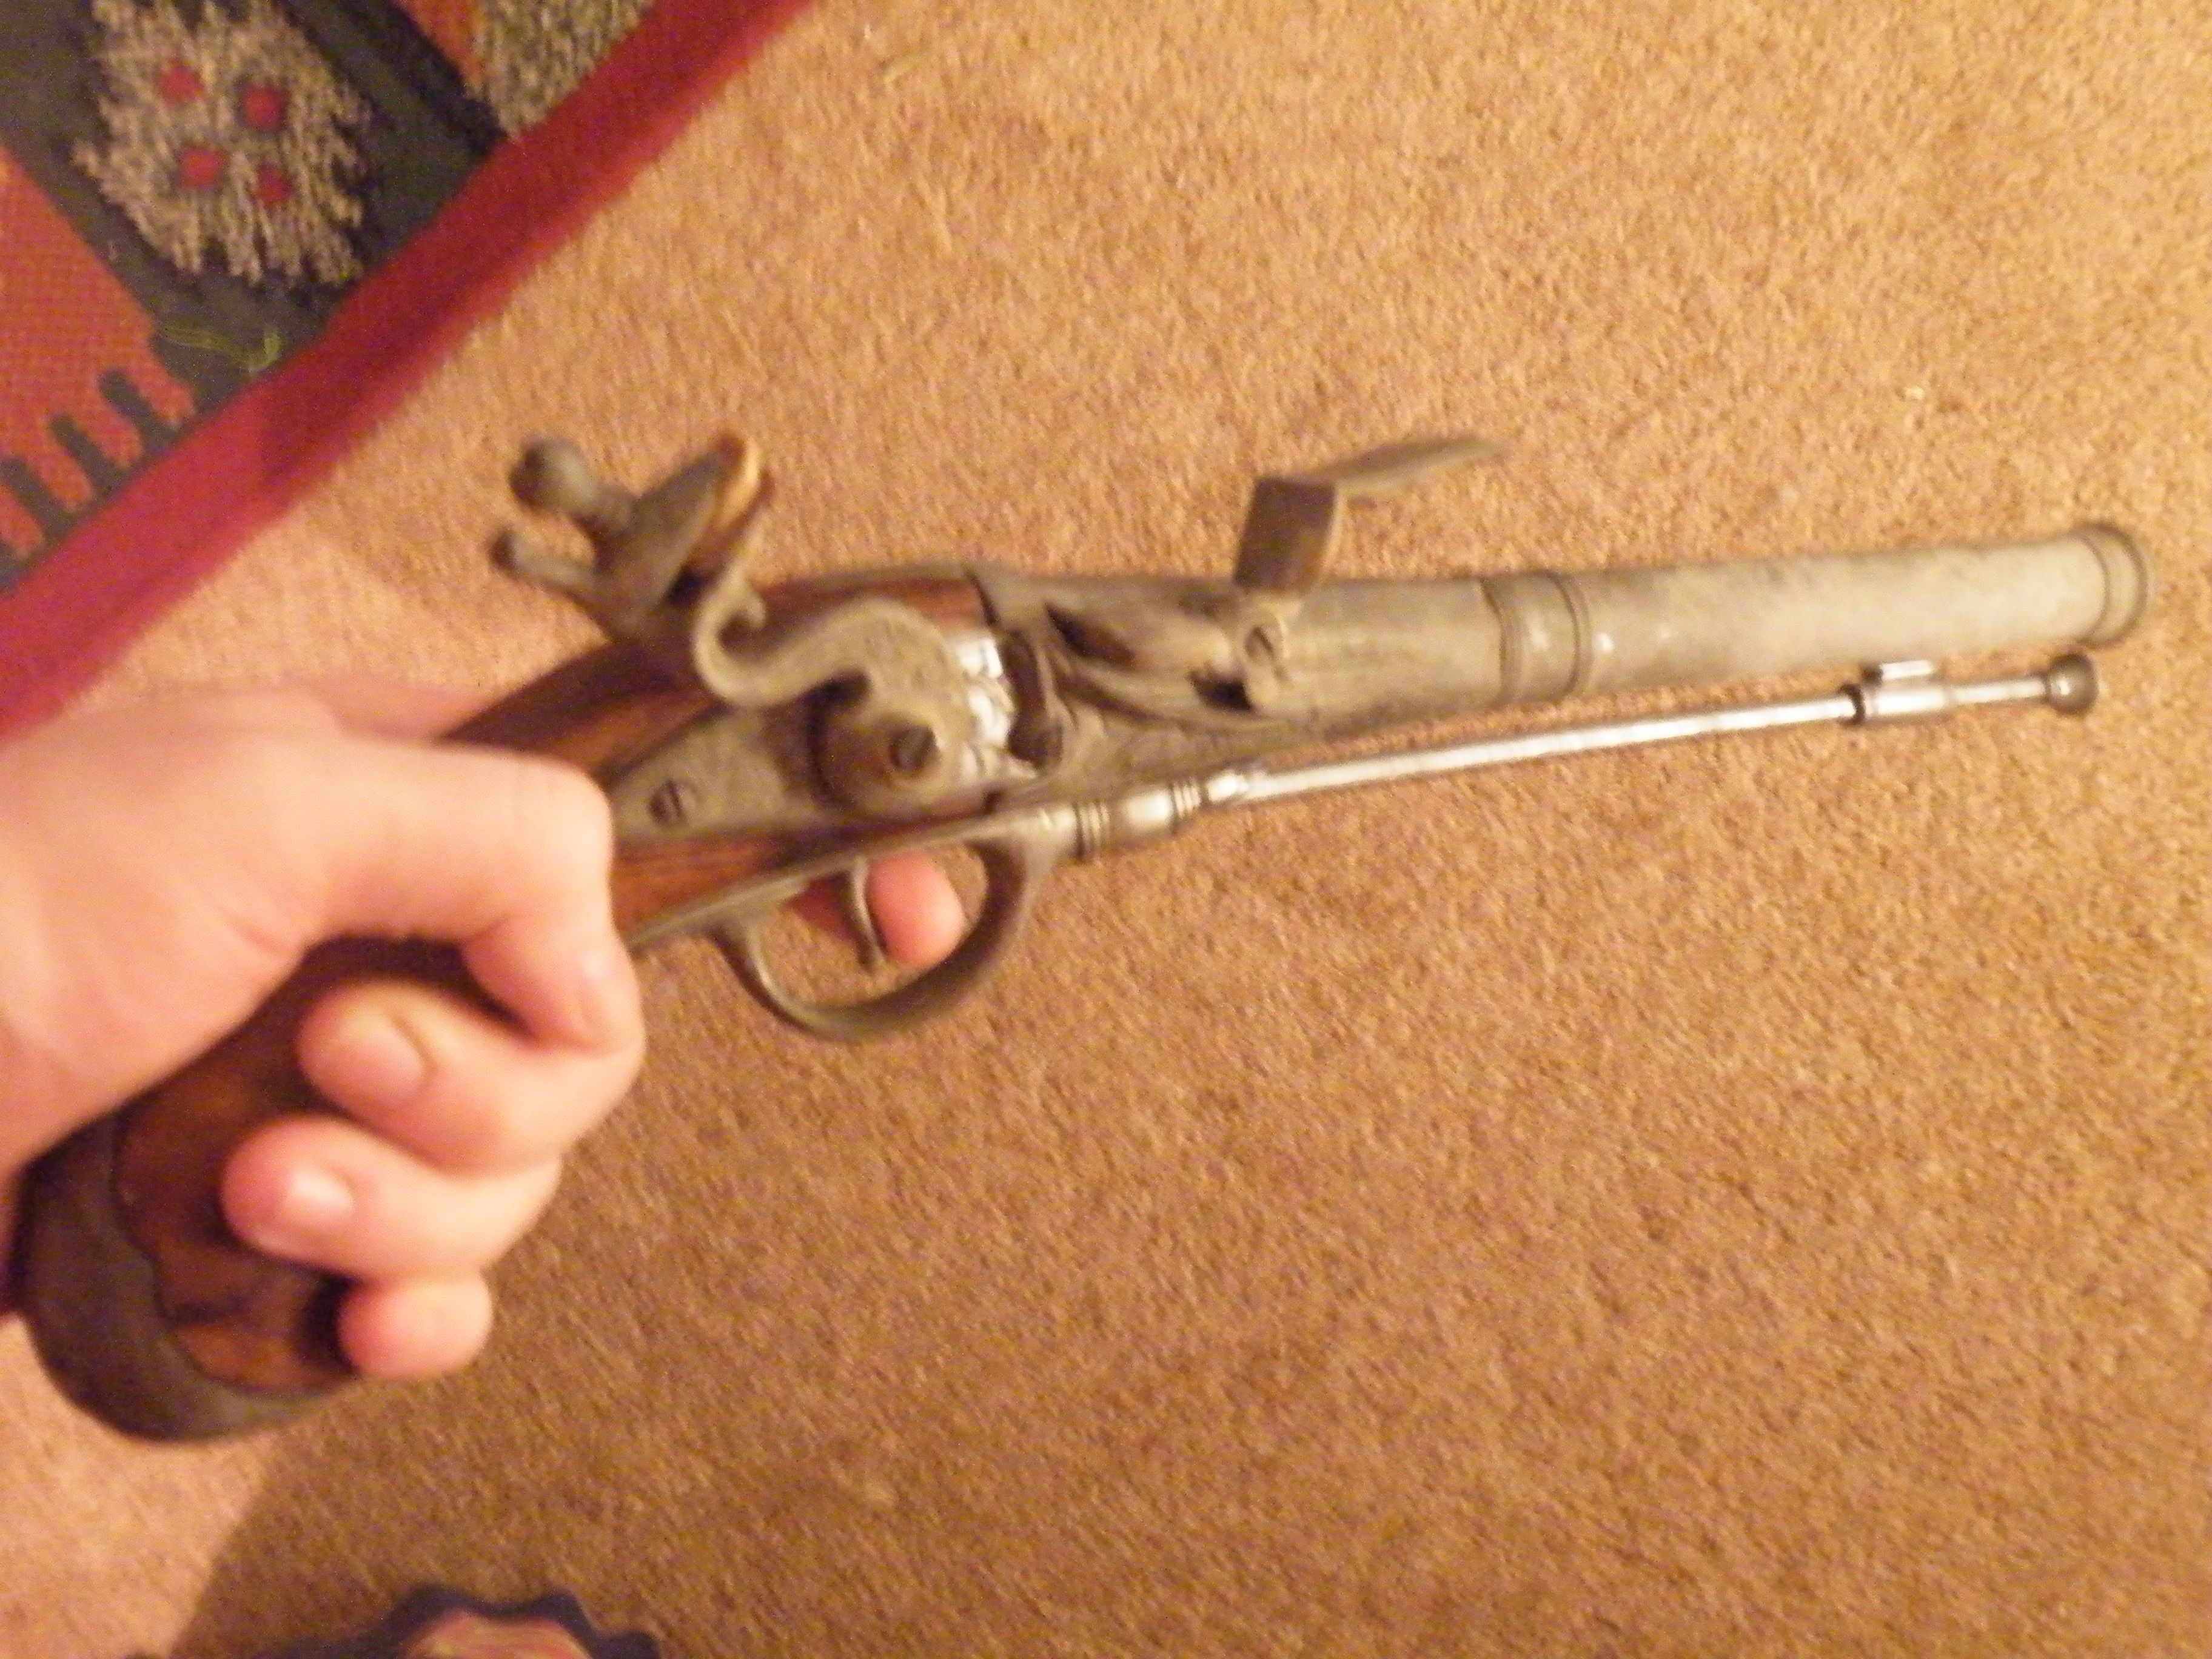 C18th replica duelling pistol